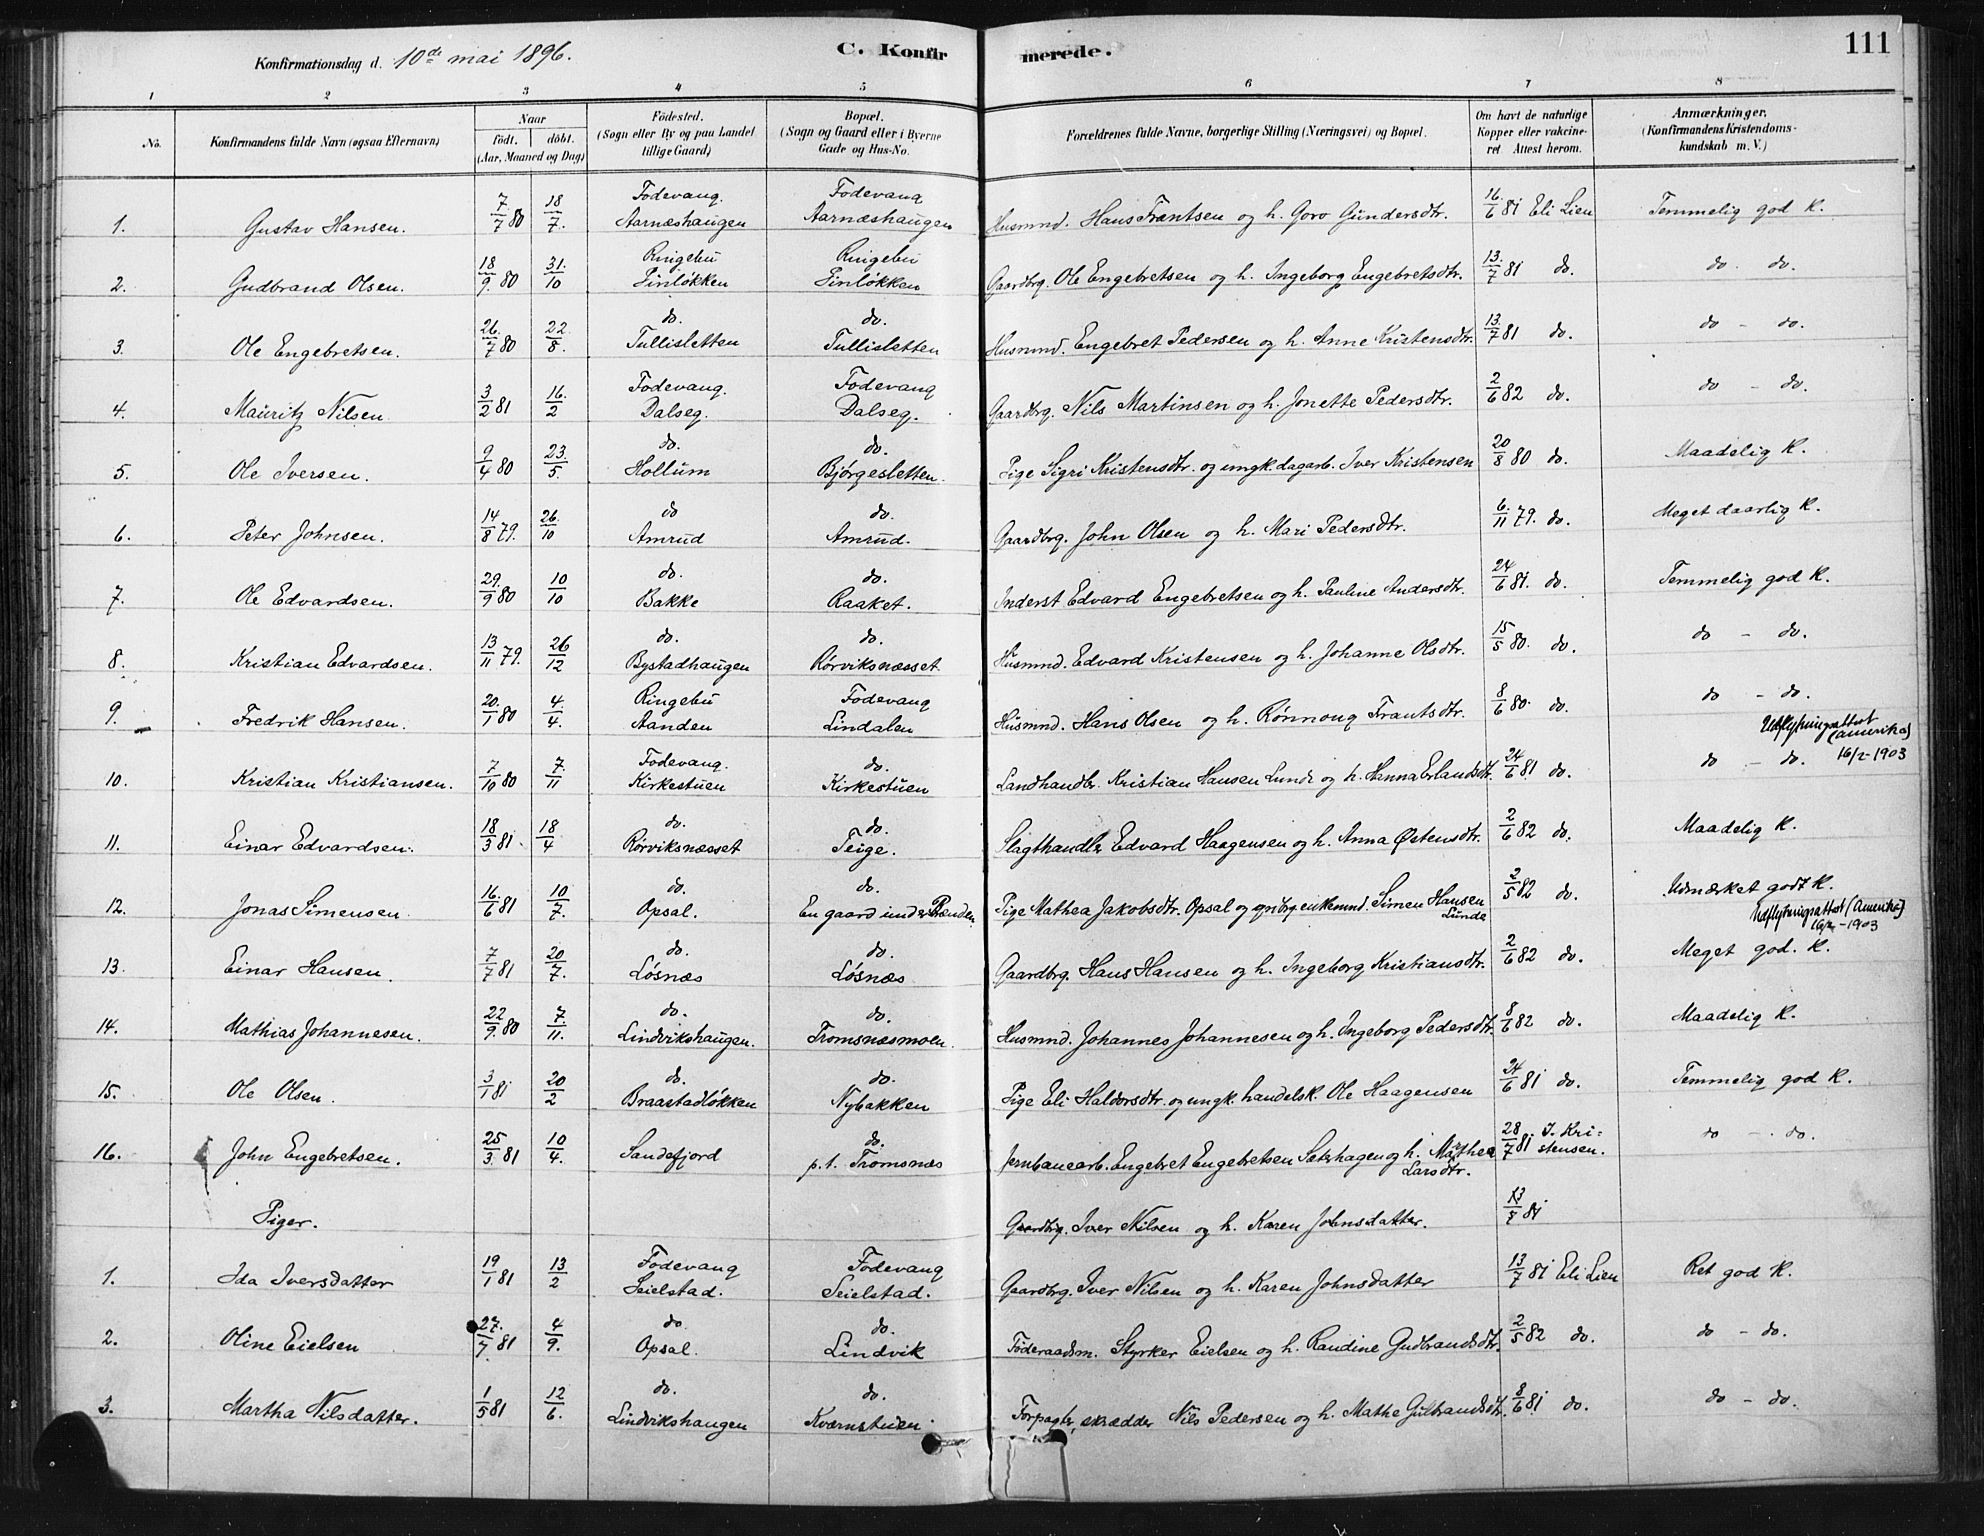 SAH, Ringebu prestekontor, Ministerialbok nr. 9, 1878-1898, s. 111